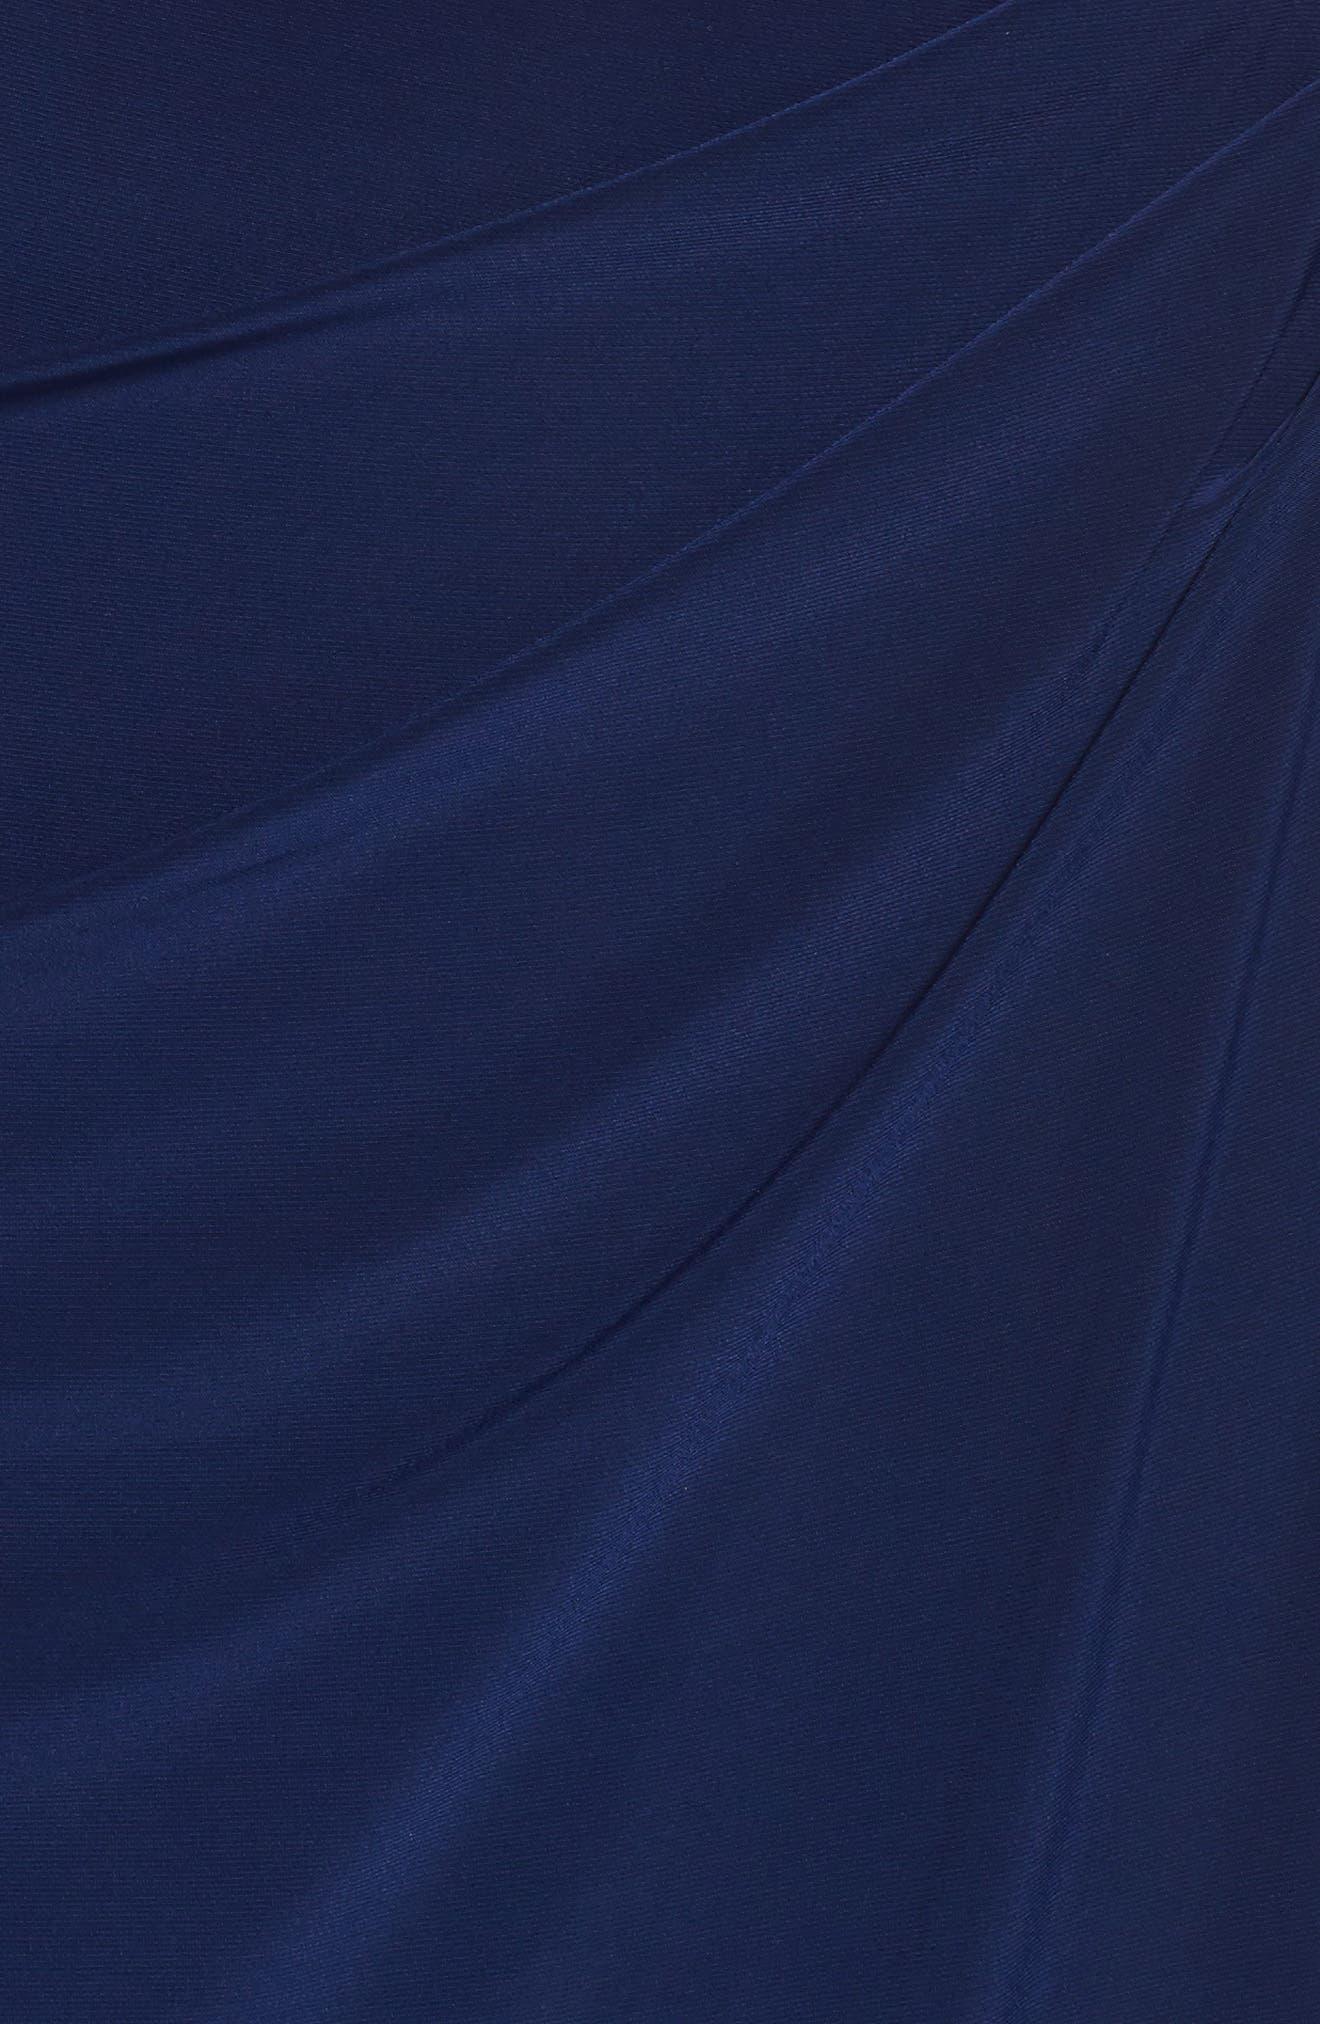 Embellished Faux Wrap Gown,                             Alternate thumbnail 5, color,                             Cobalt